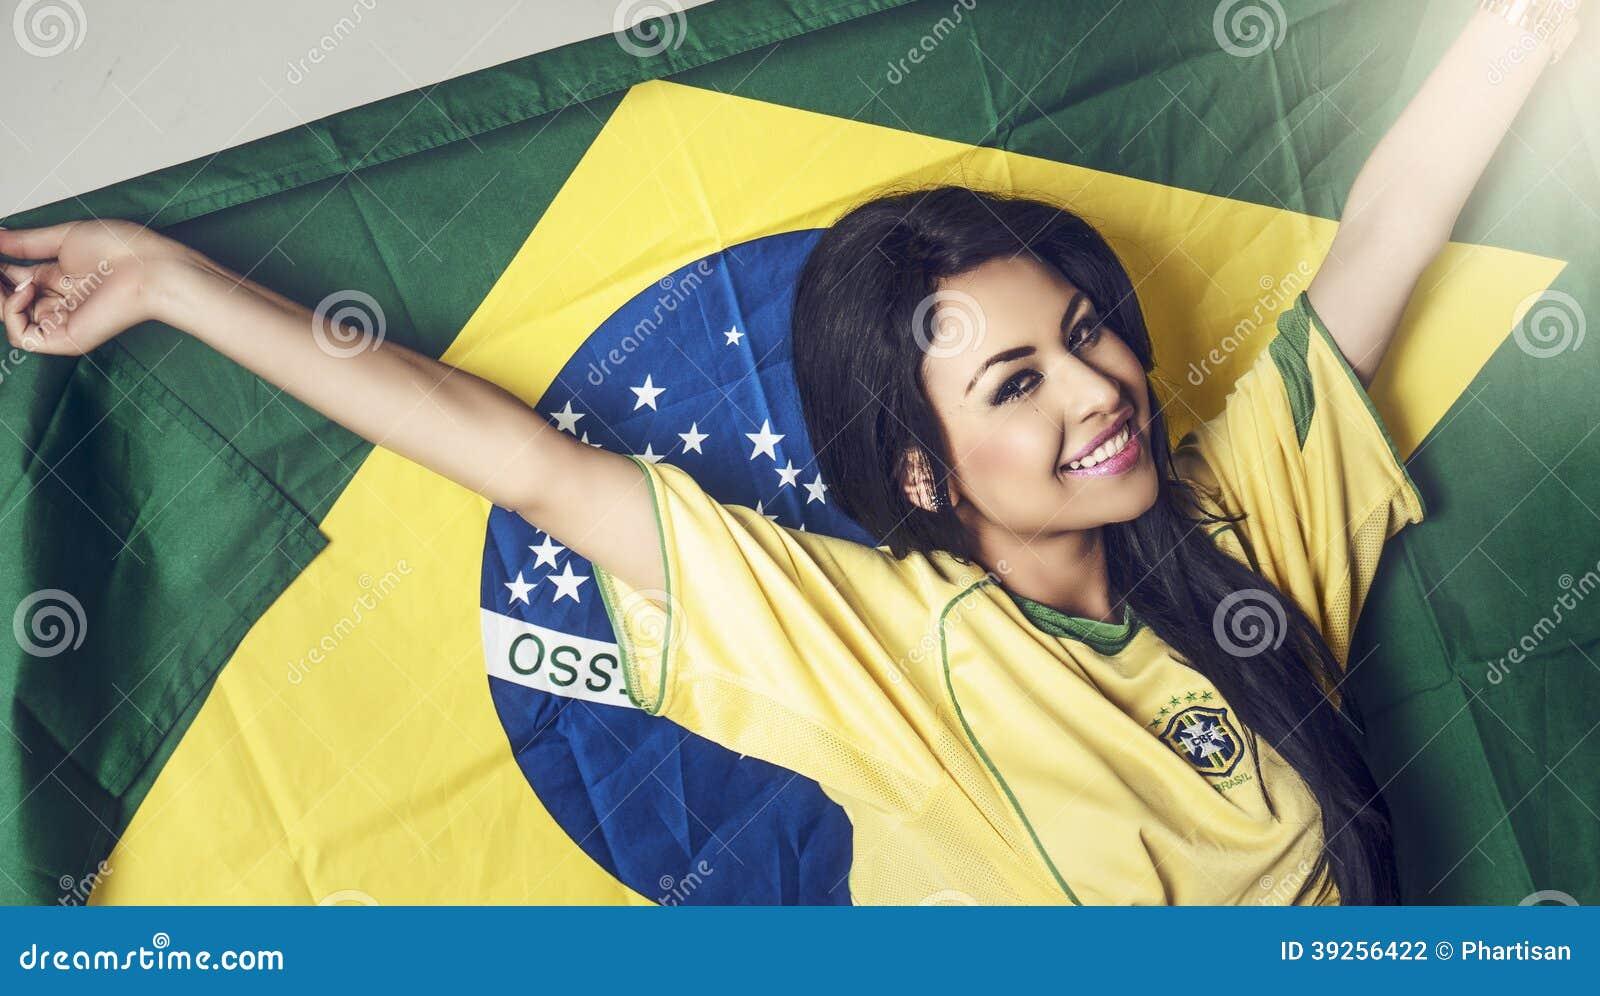 Brazilians dating underage girl